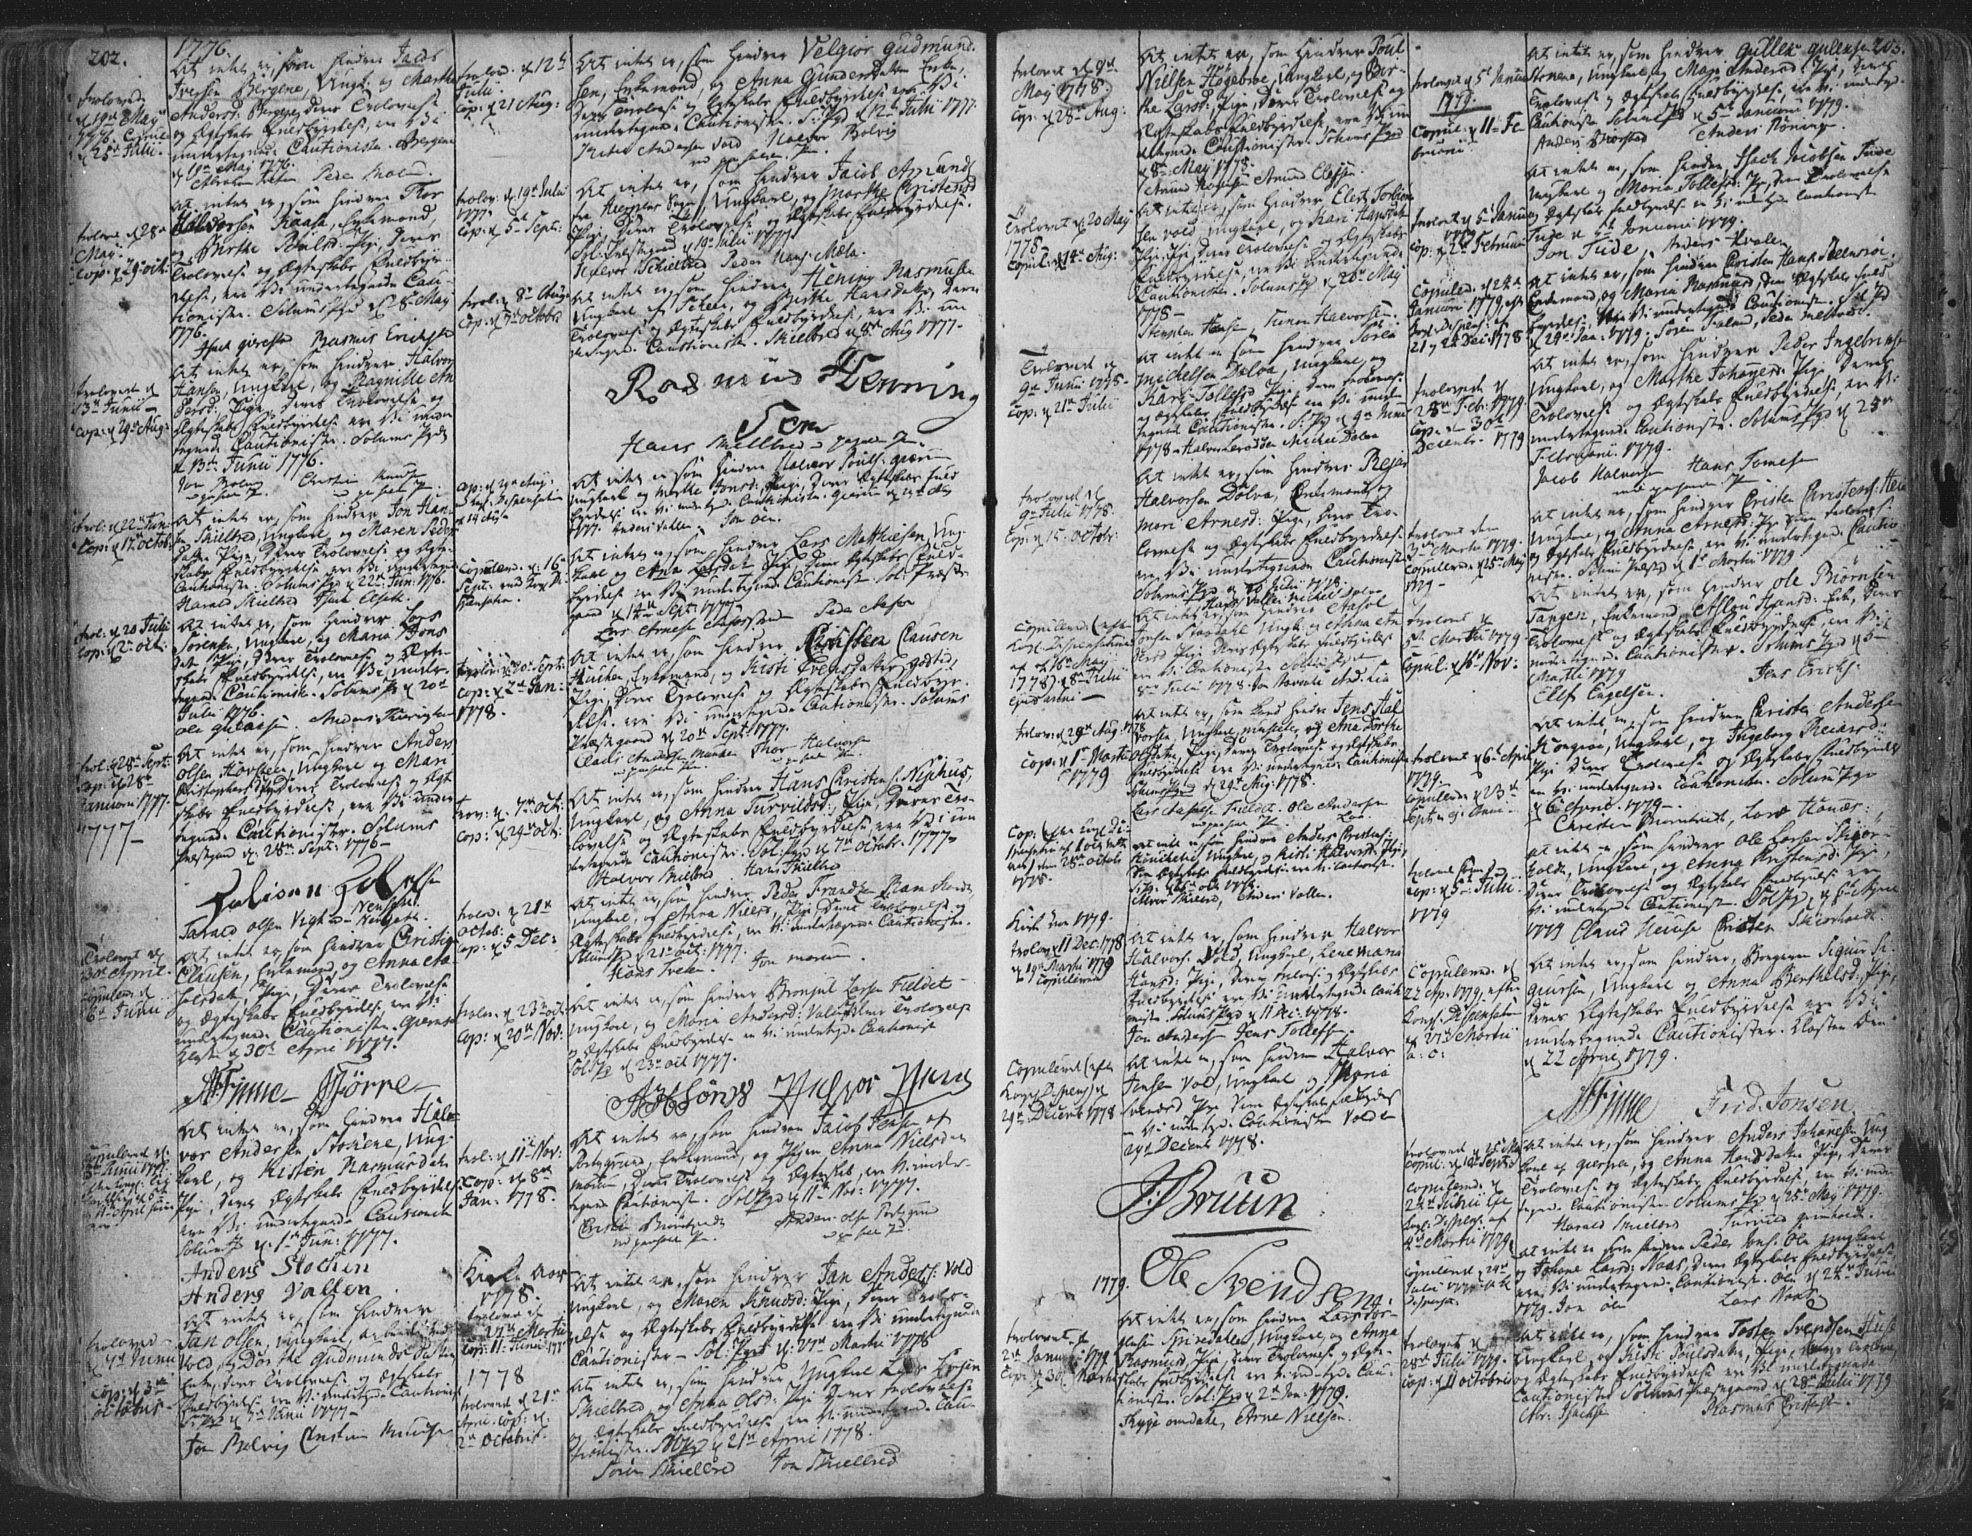 SAKO, Solum kirkebøker, F/Fa/L0003: Ministerialbok nr. I 3, 1761-1814, s. 202-203